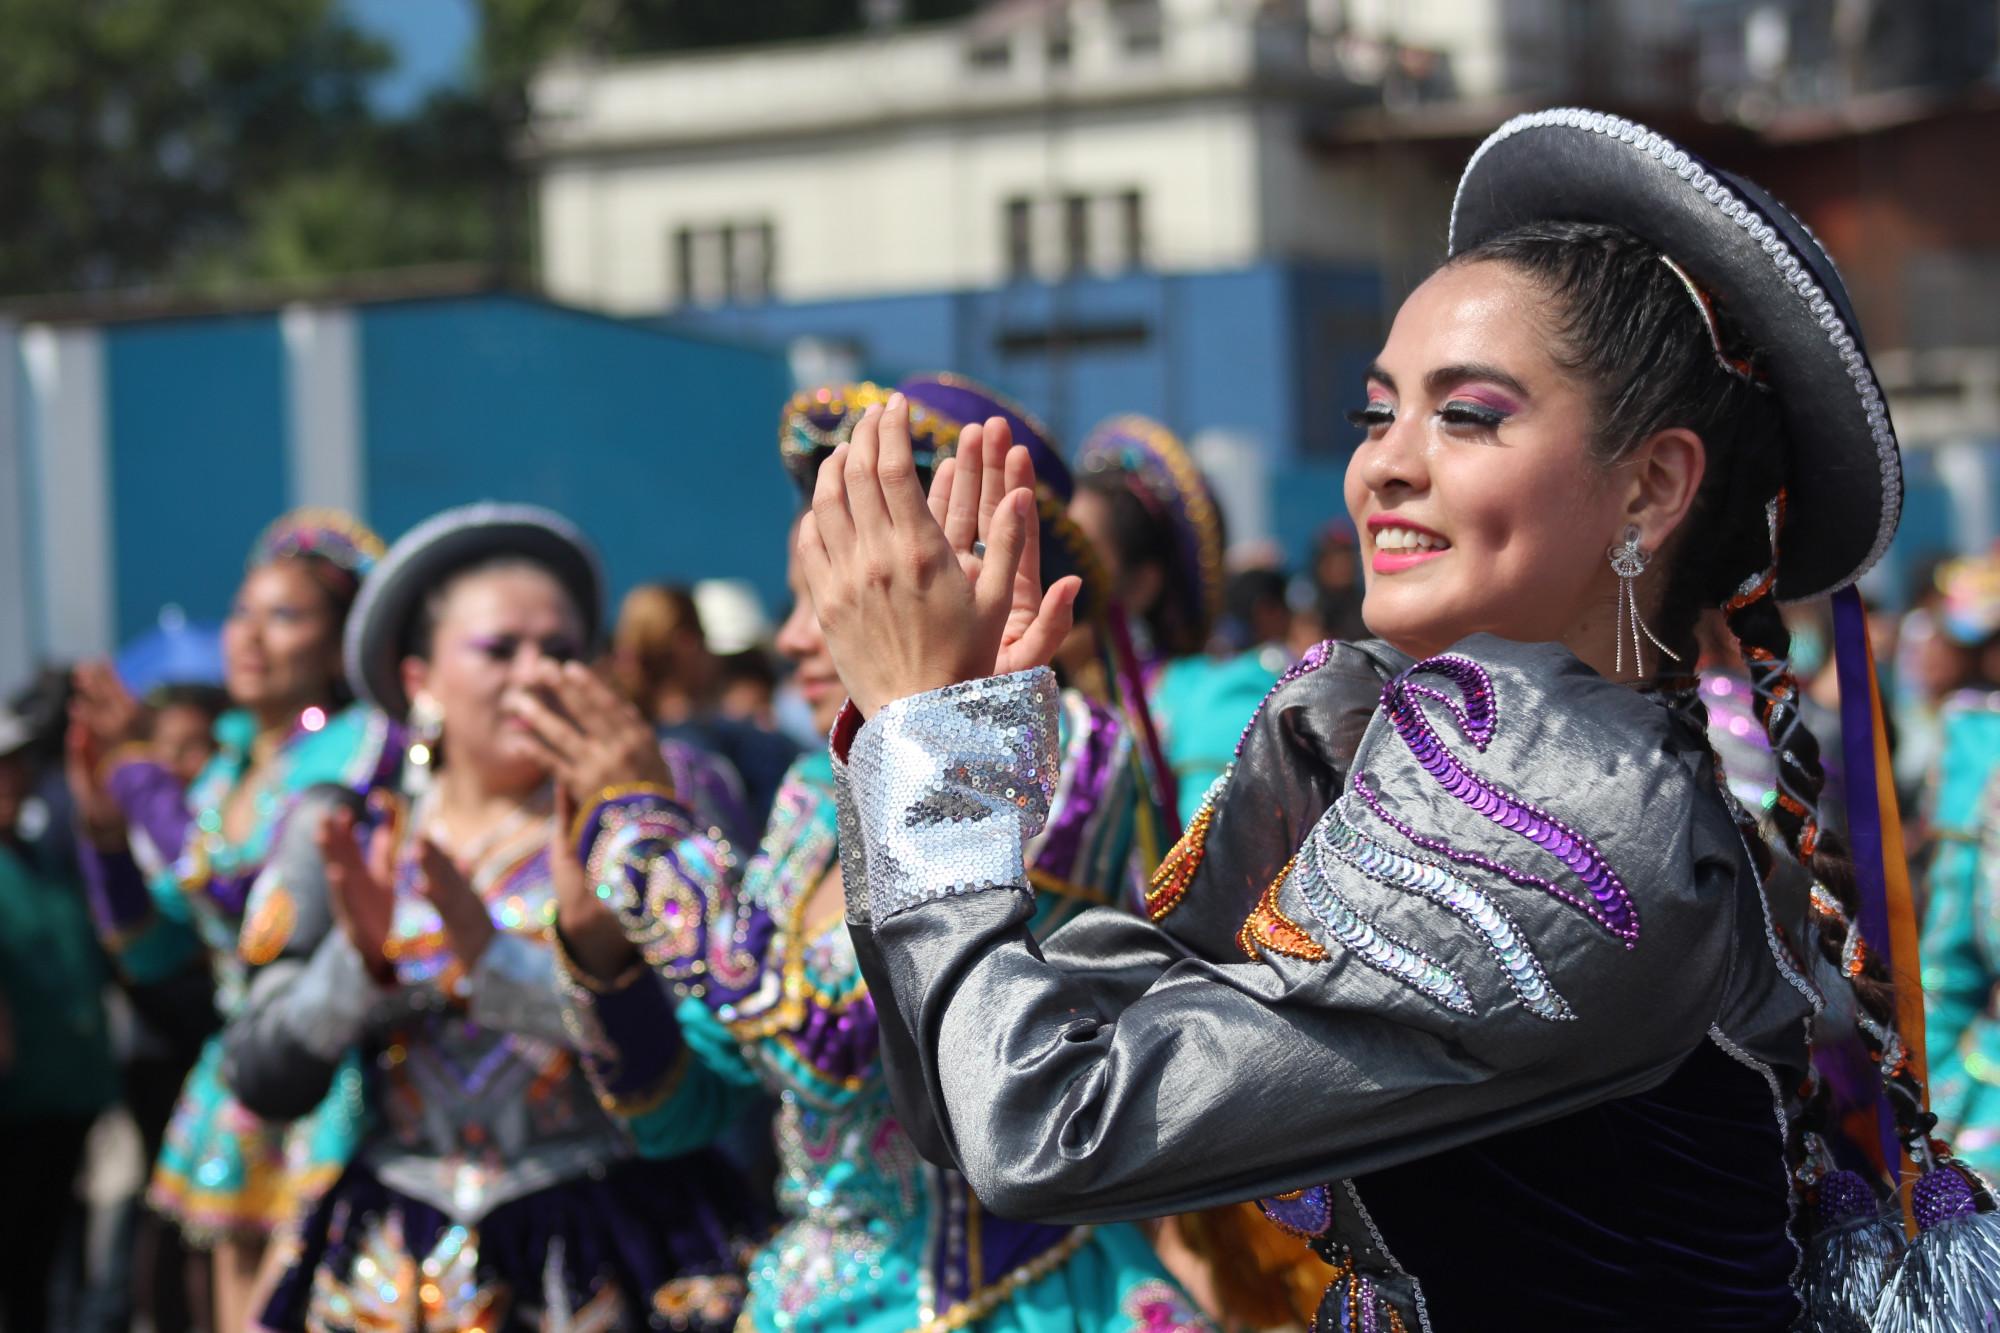 Peruvian women clapping during local festivities